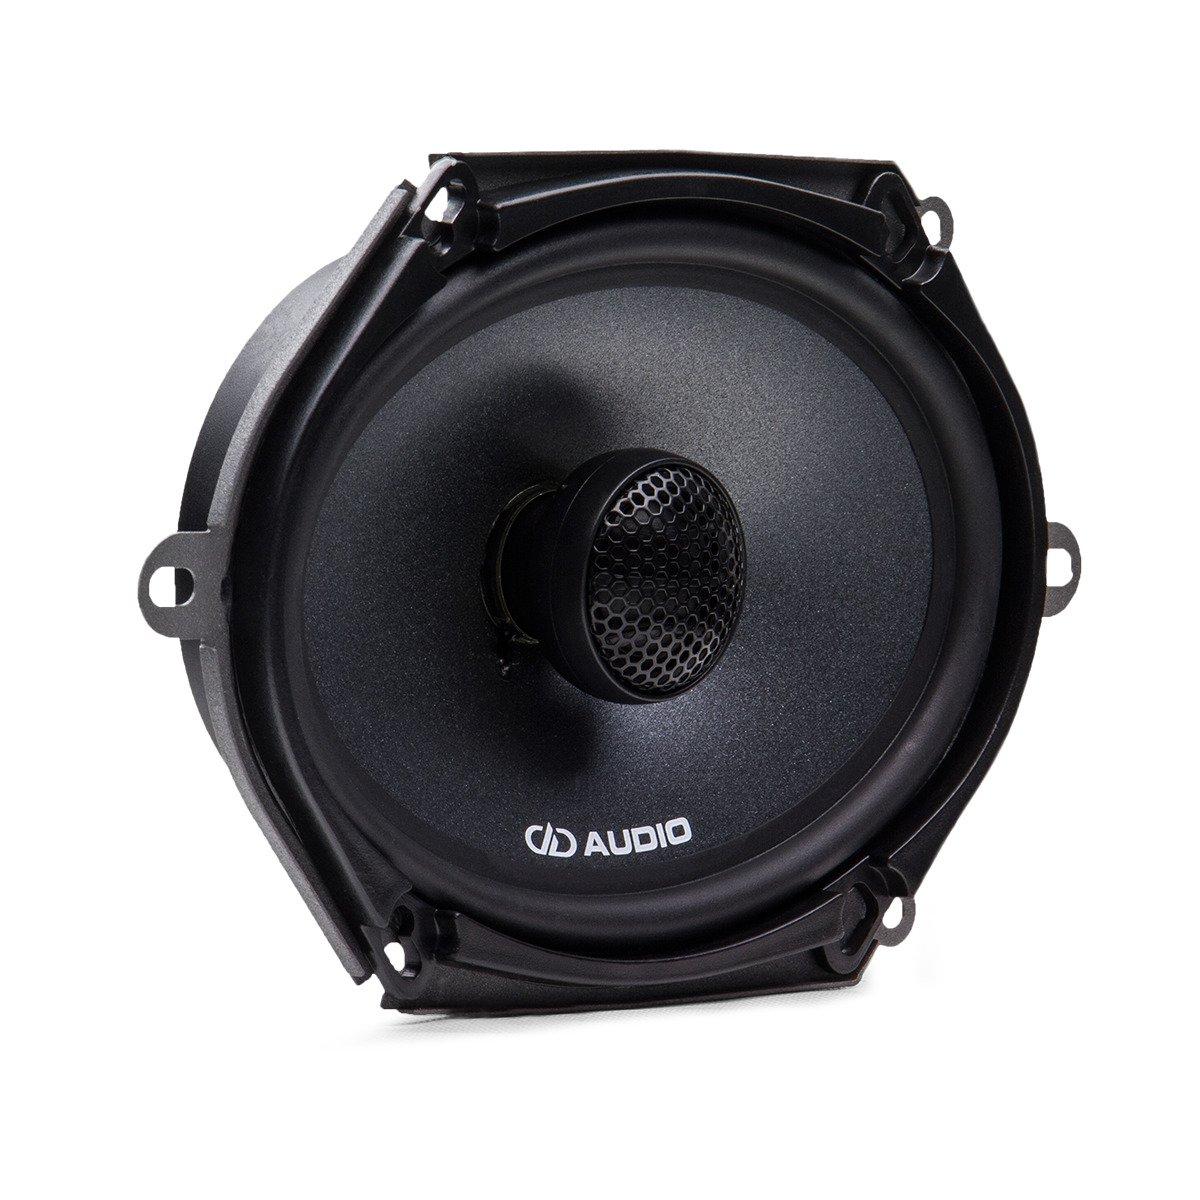 "DD Audio DX5X7 5X7"" S4 Speaker -"